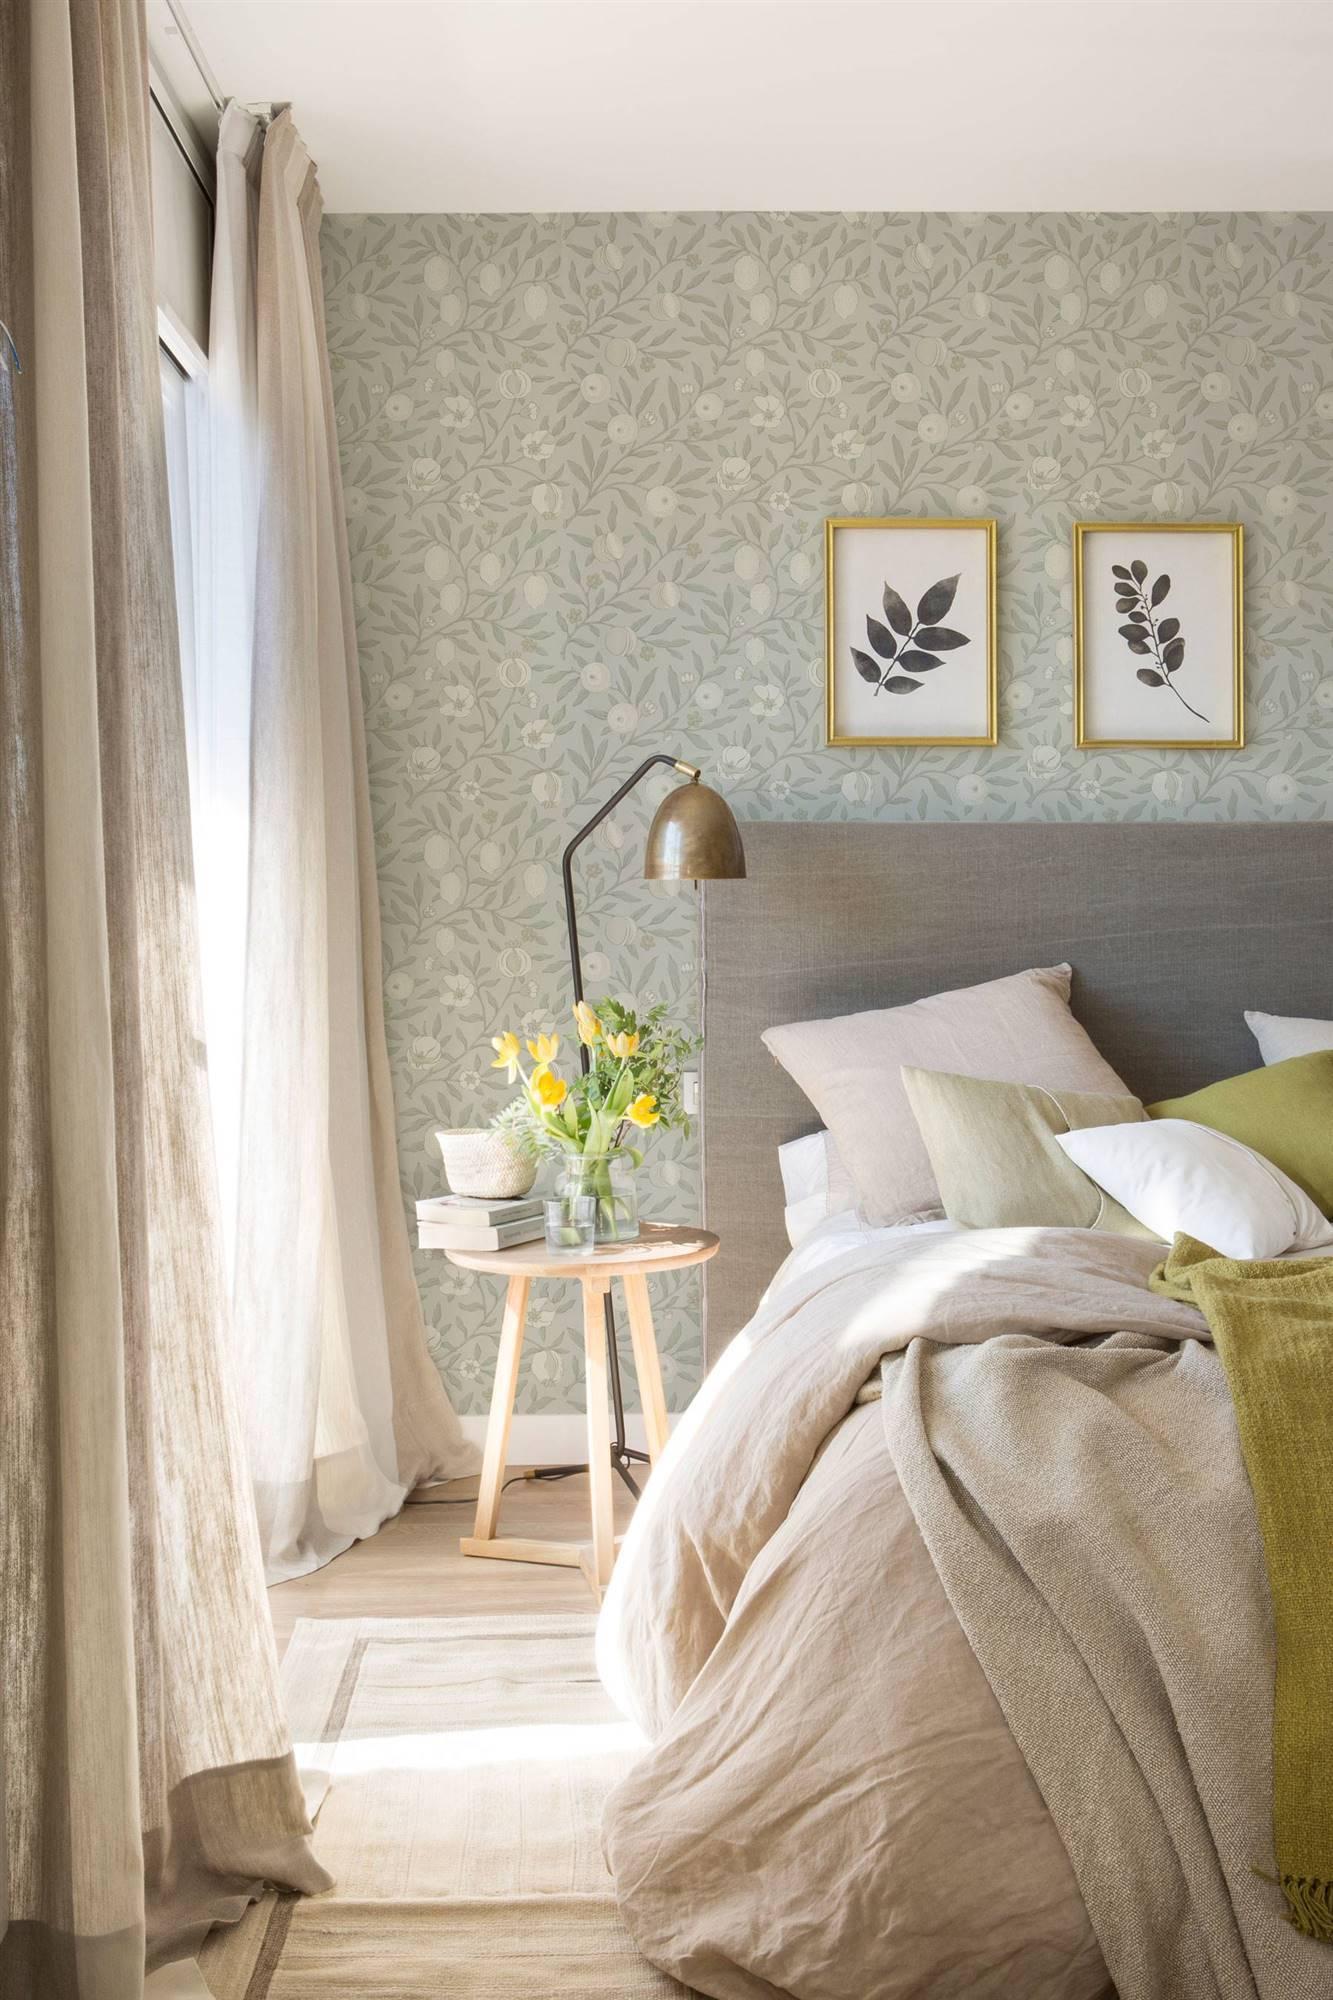 50 papeles pintados para dar vida tu casa - Dormitorios con papel pintado ...